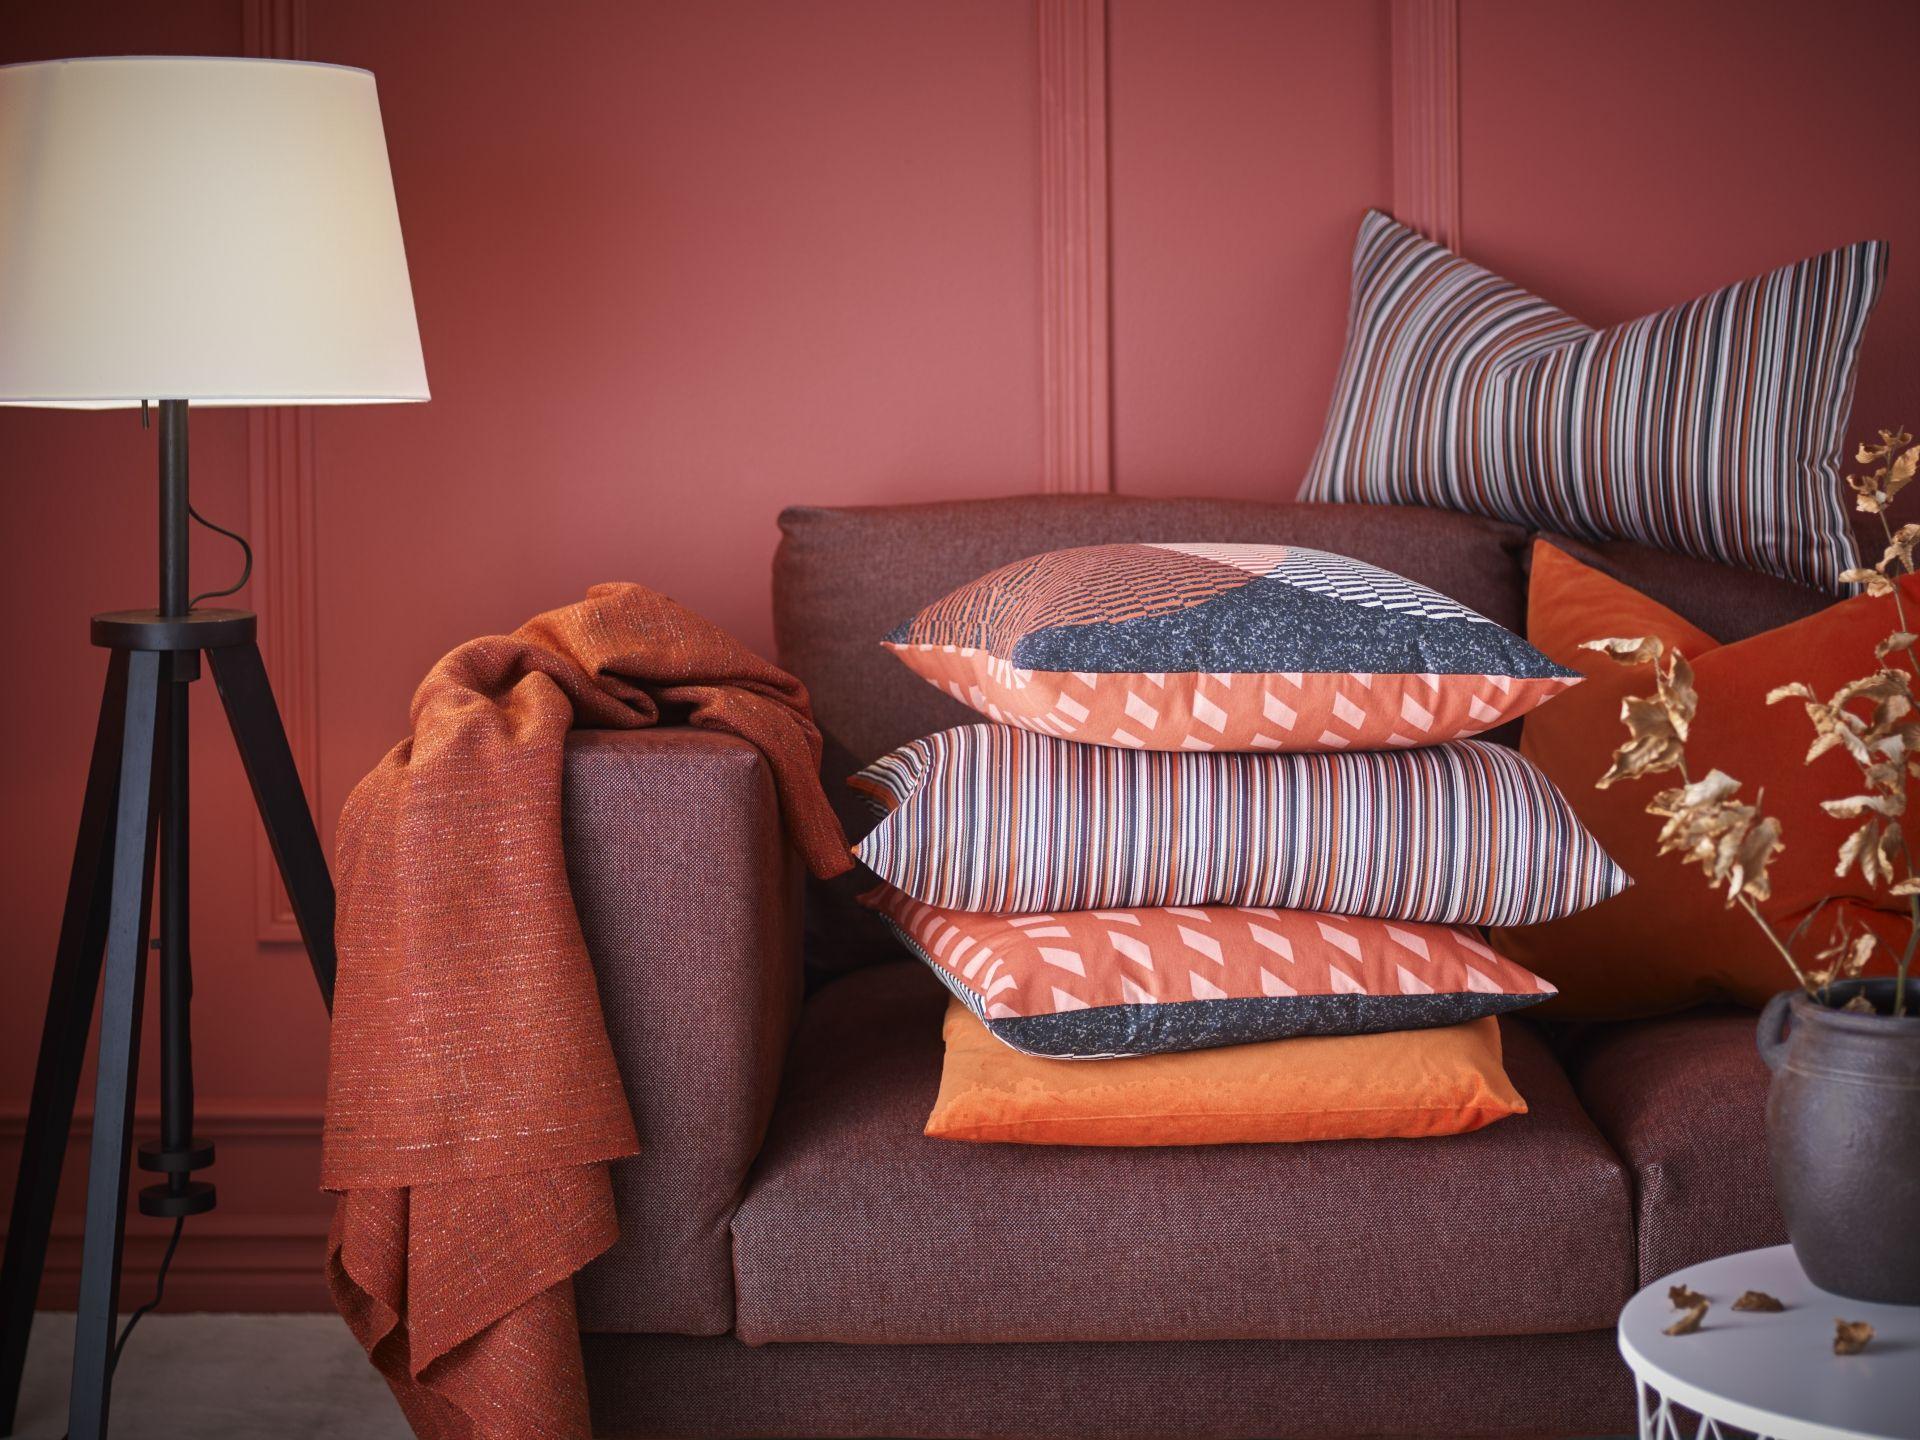 STRANDKÅL Kussenovertrek, oranje, rood | Door de, Color inspiration ...